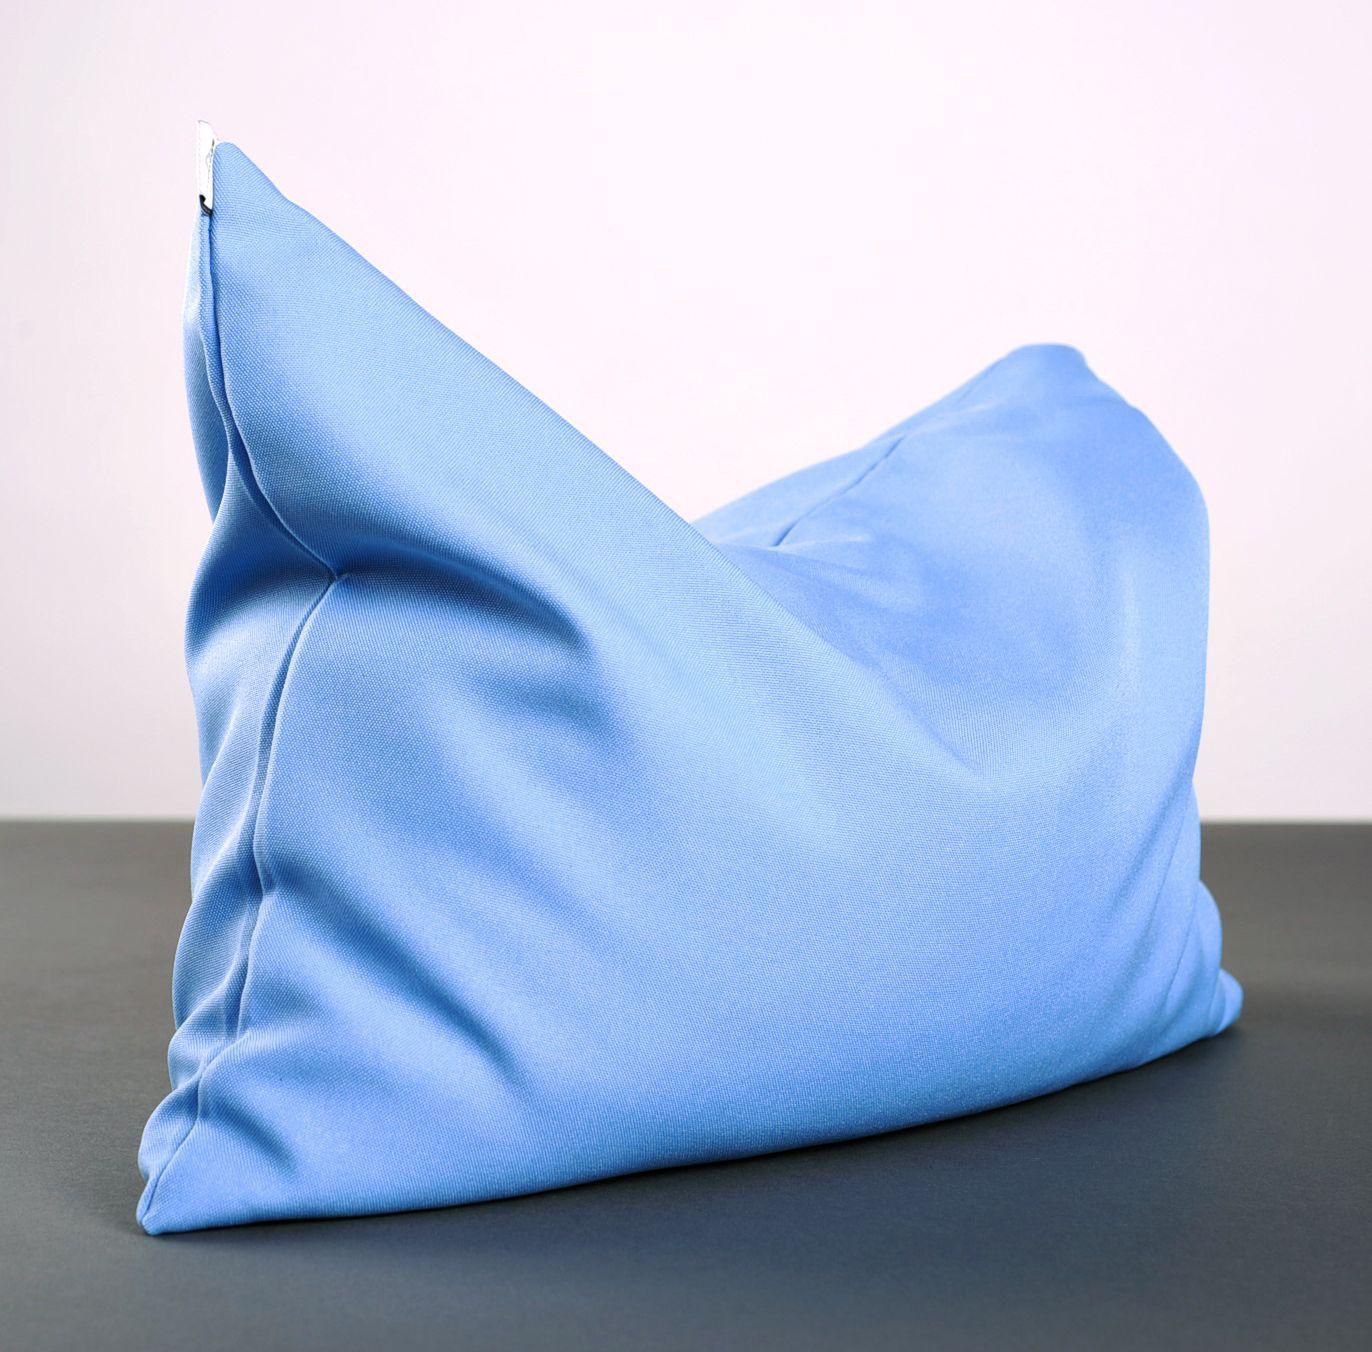 Blue yoga pillow photo 5